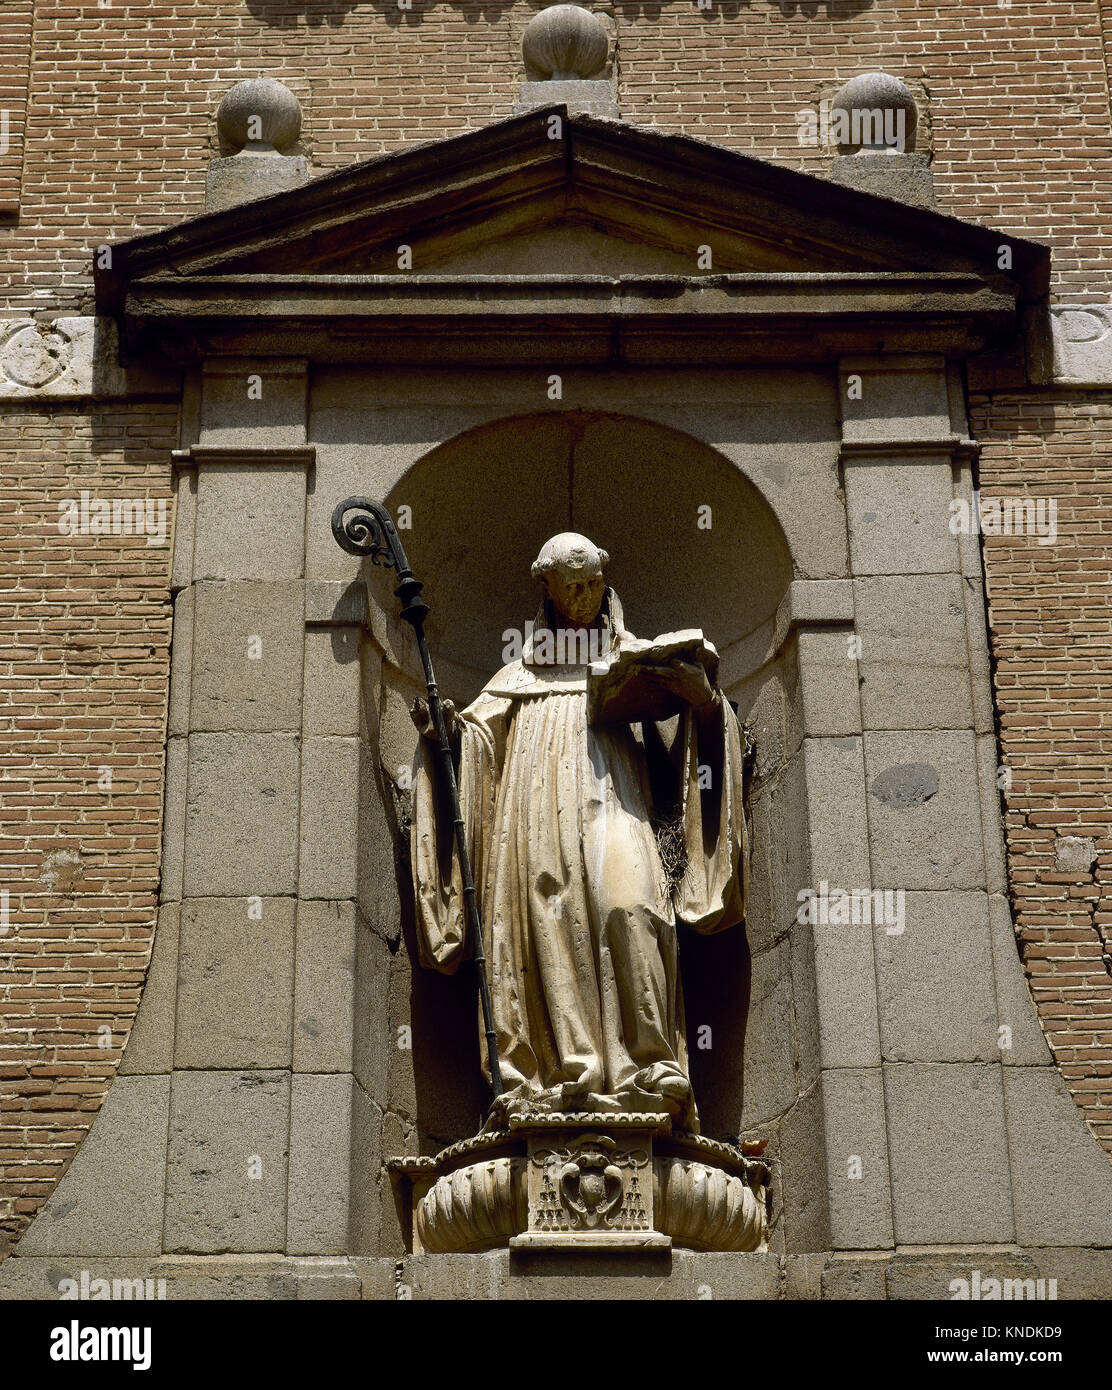 Saint Bernardo Calvo (1180-1243). Bishop and abbot of the monastery of Santa Creus. Statue on St. Bernardo monastery, - Stock Image